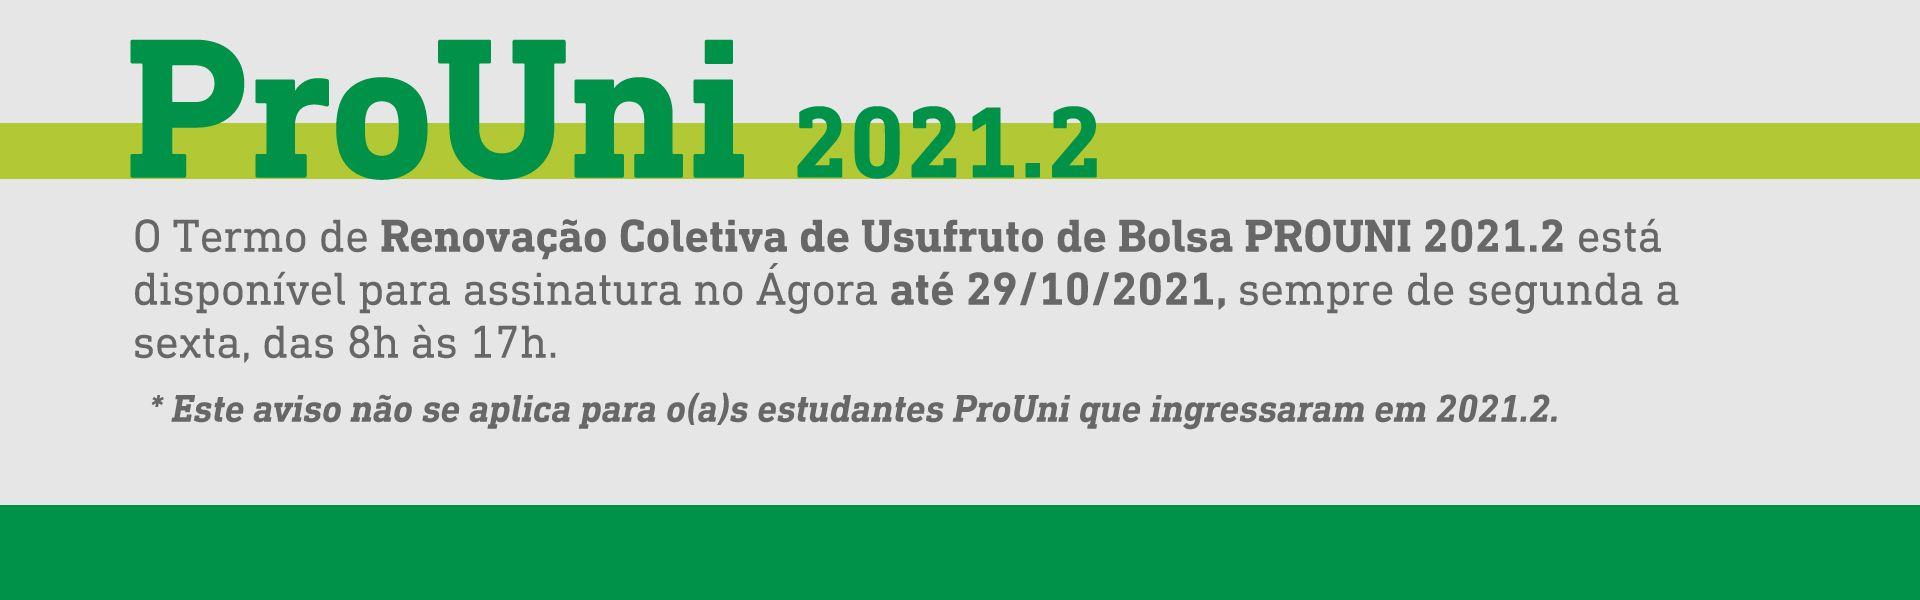 Renovação Coletiva - ProUni 2021.2